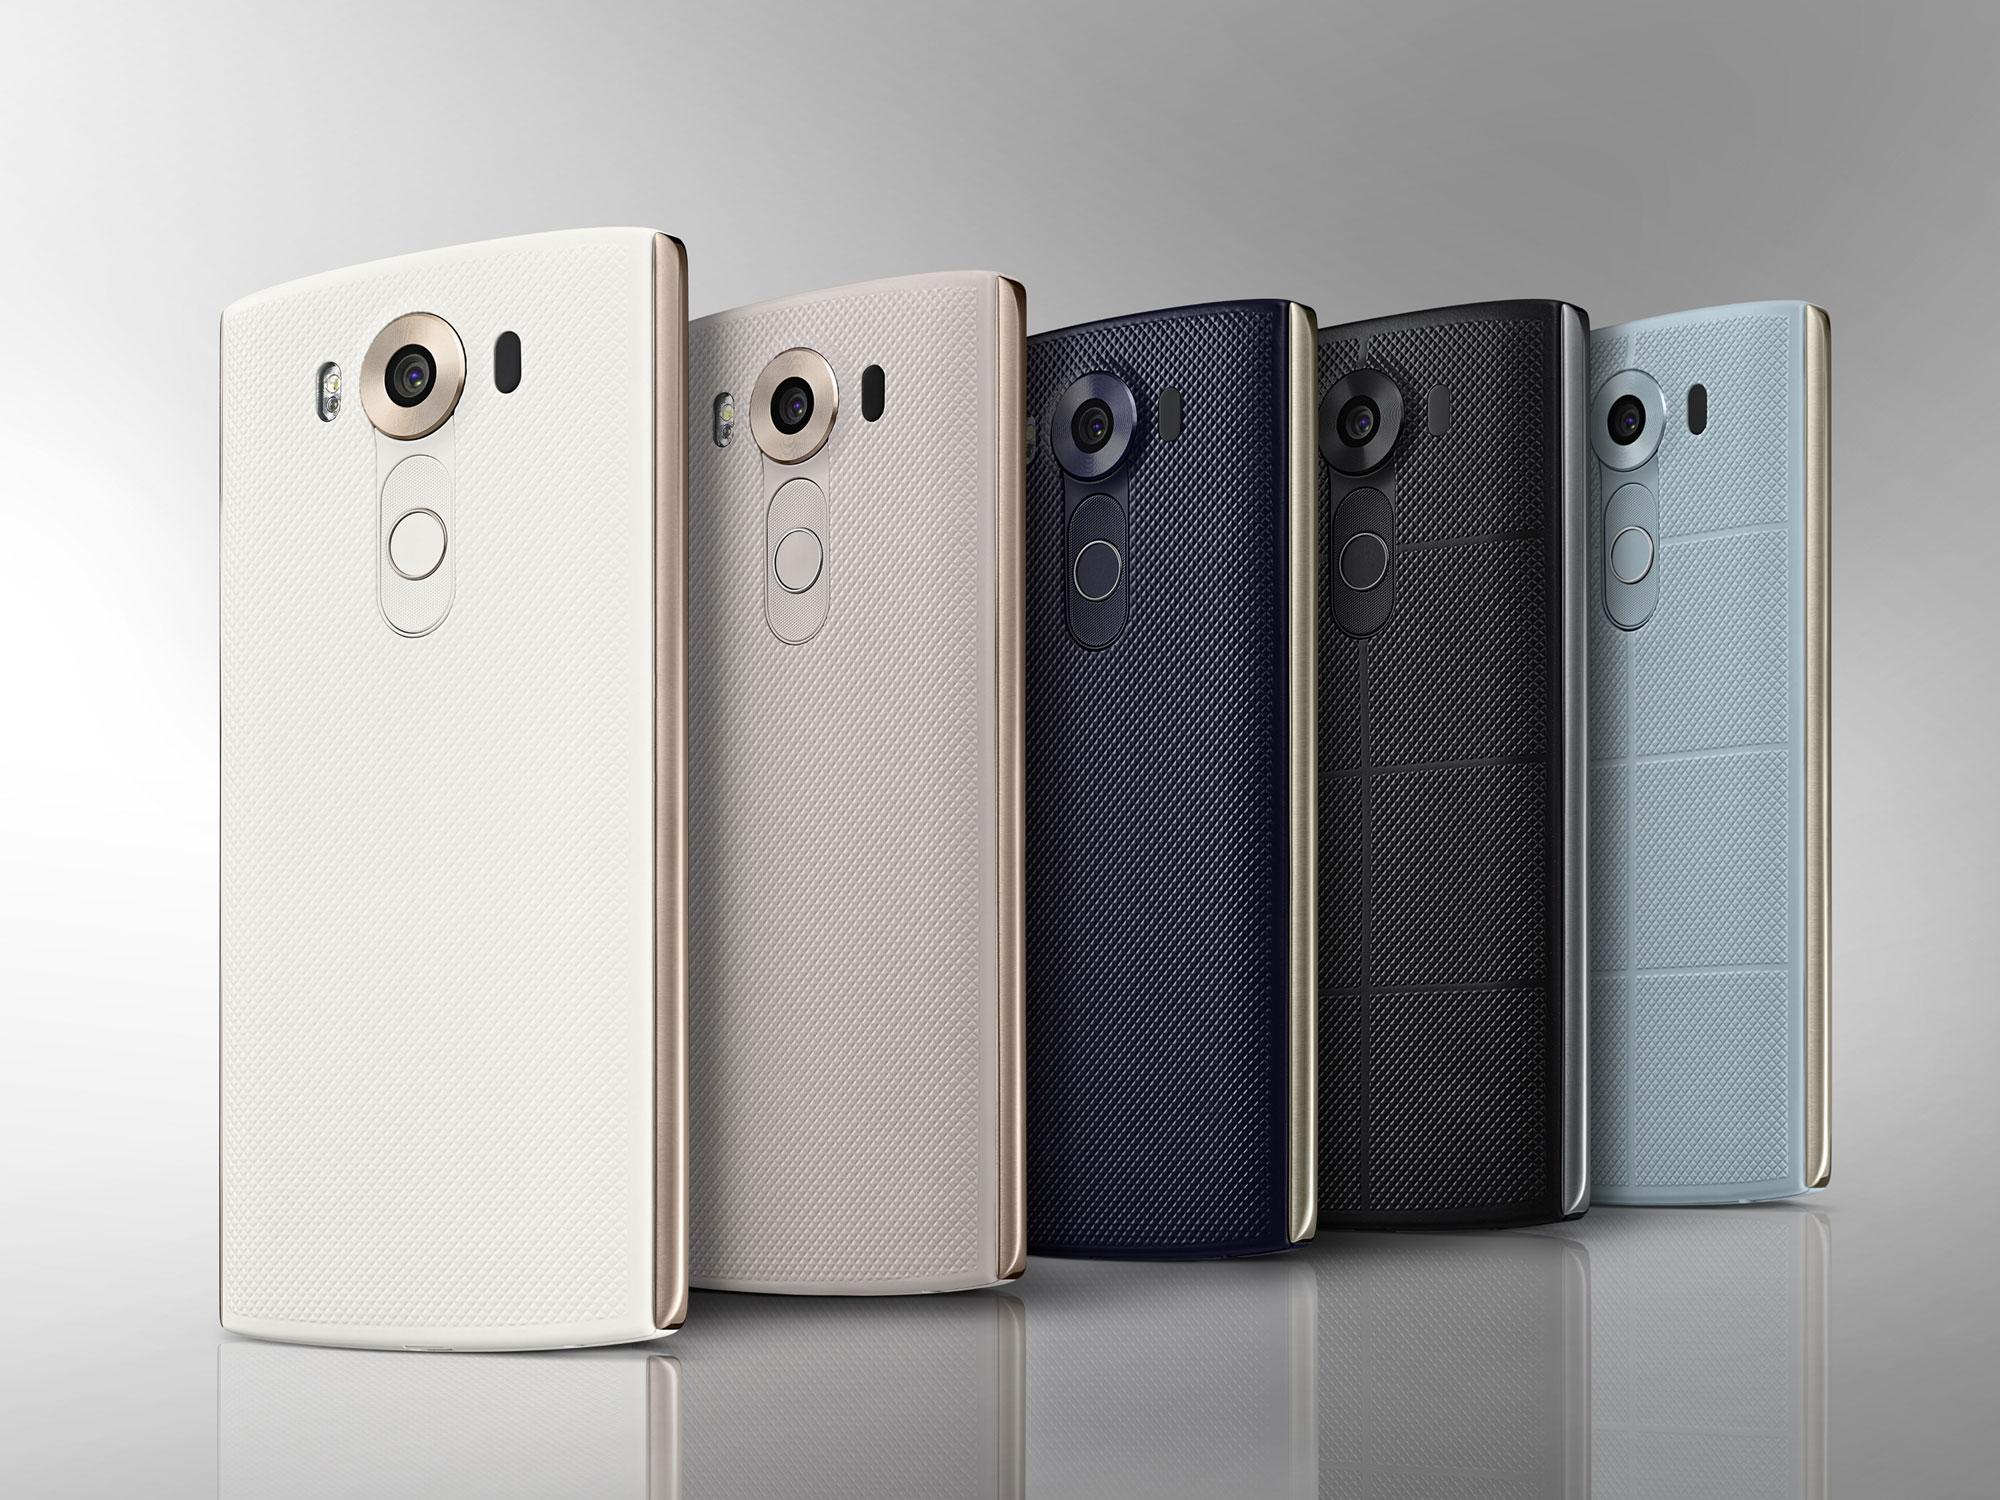 The LG V10 Smartphone